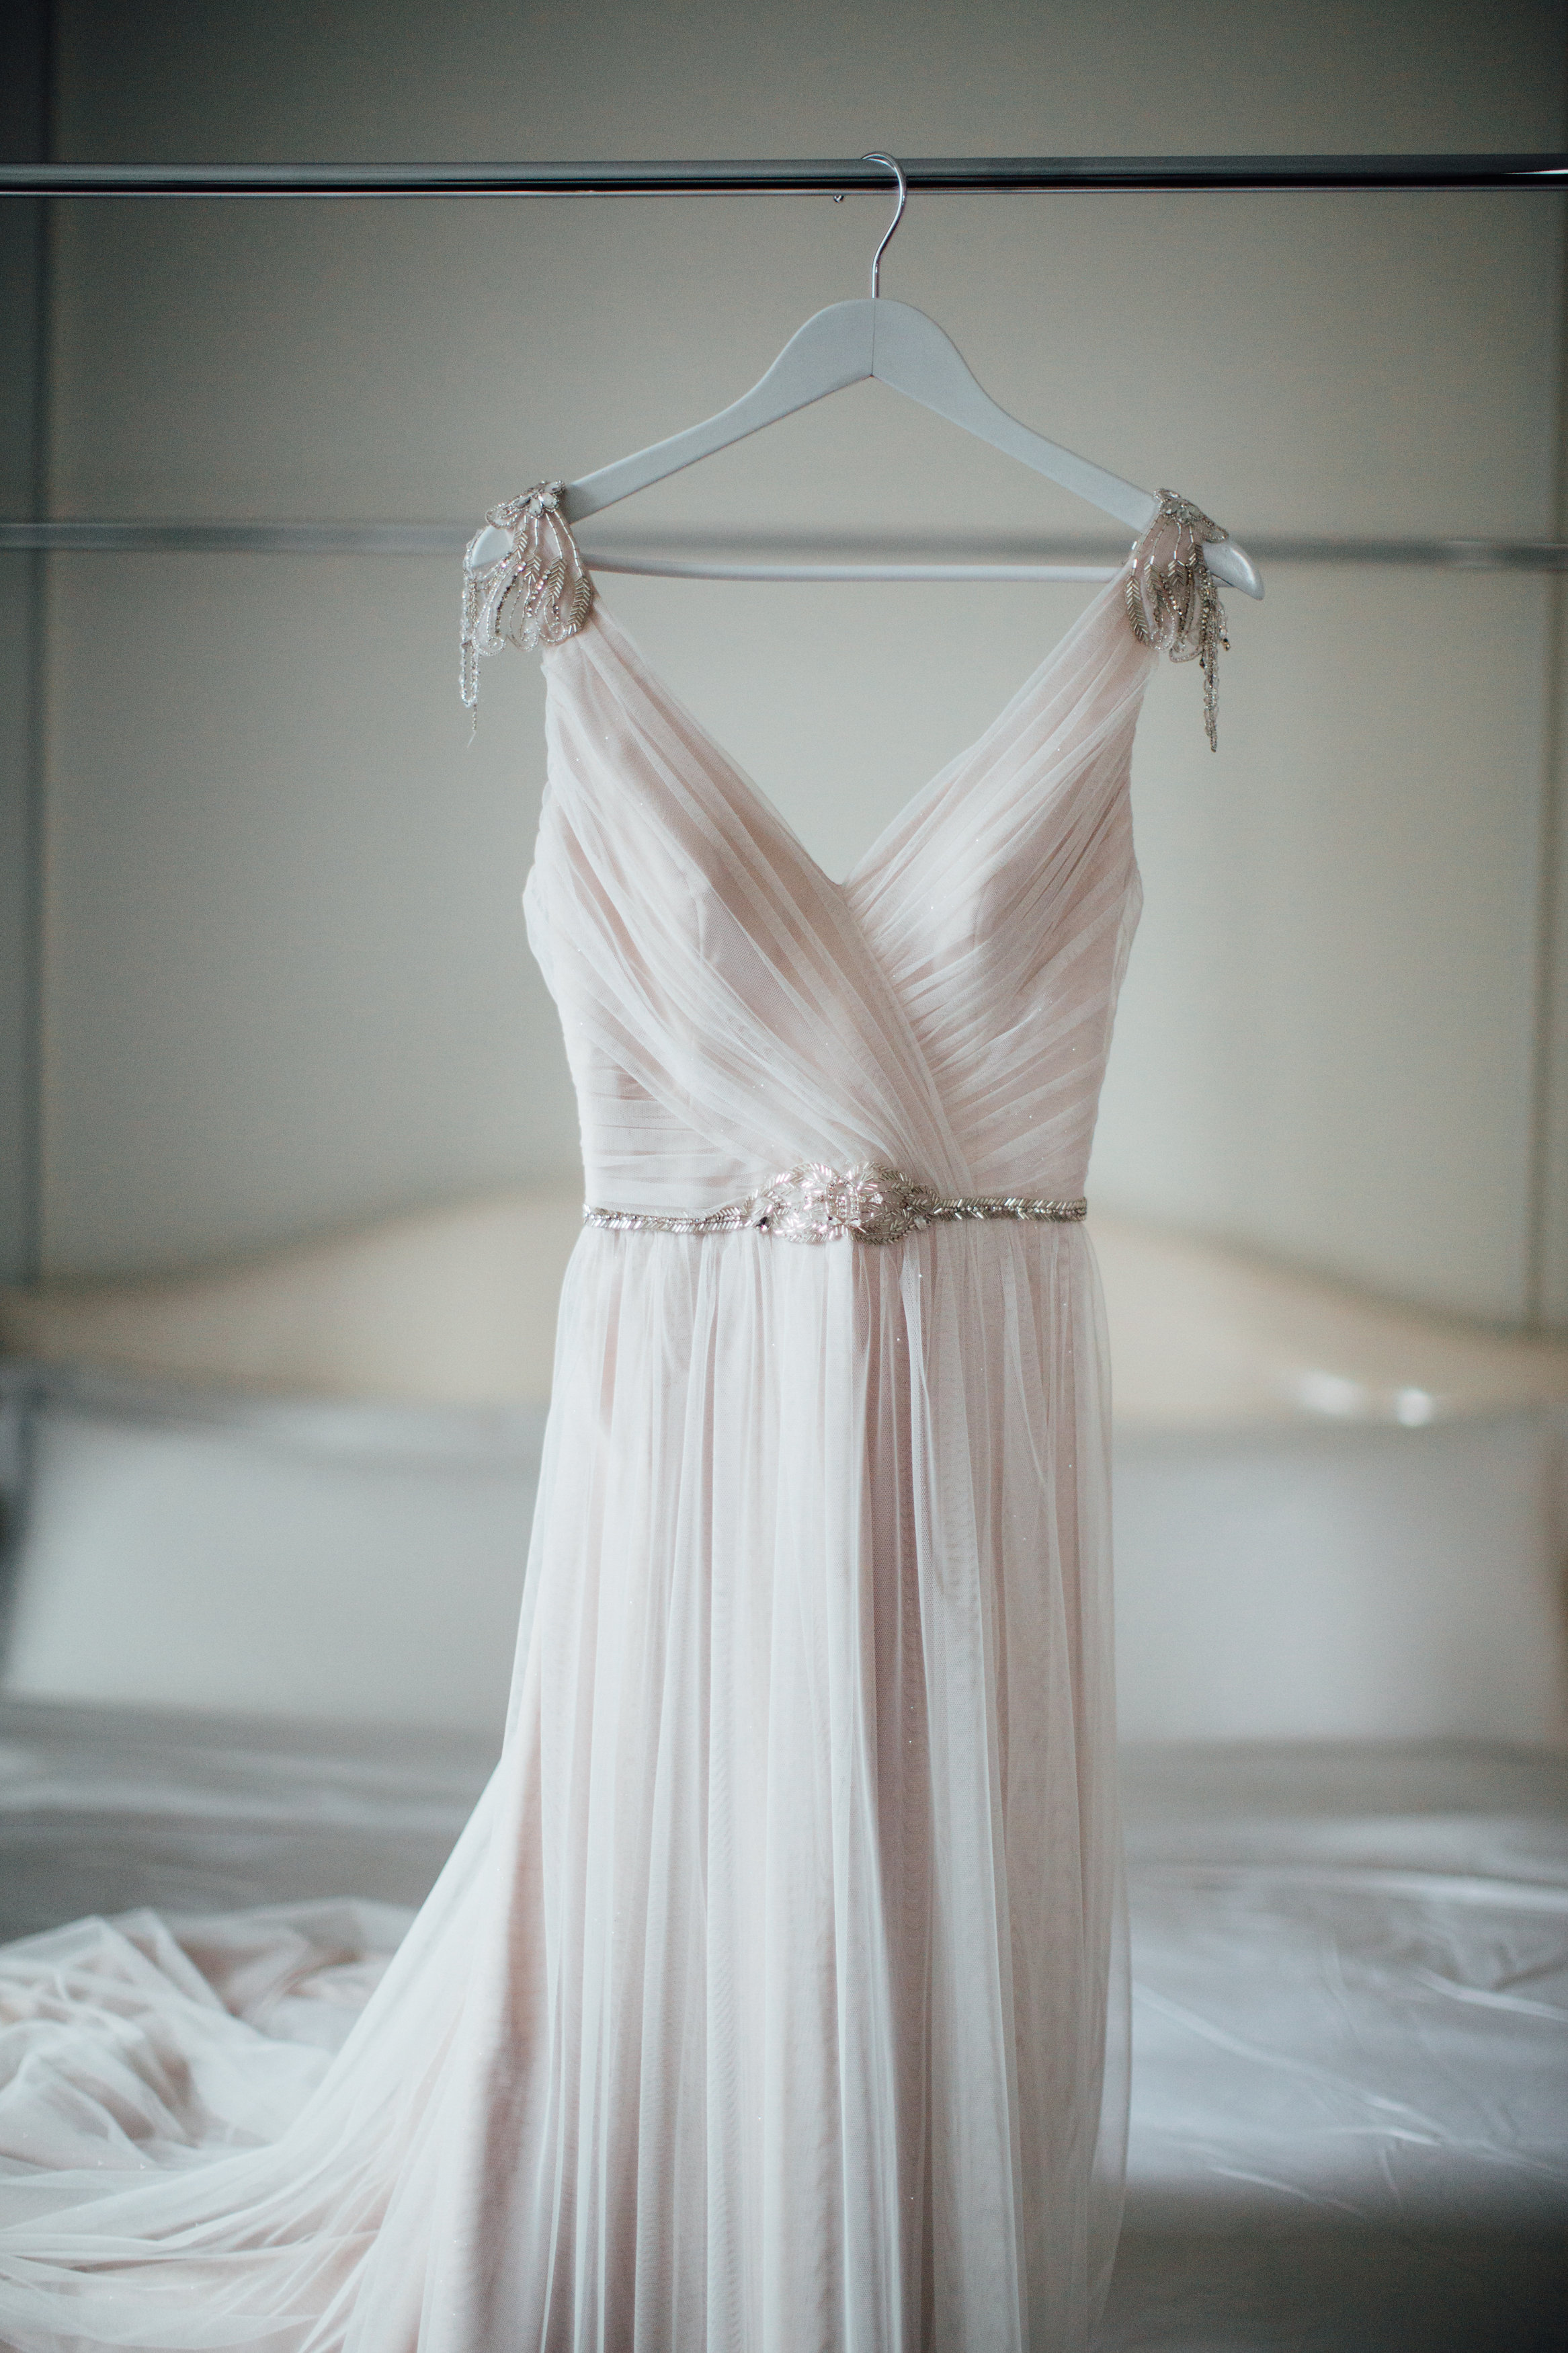 ruffled-boston-bridesmaid-wedding-gift-perfect-hayley-paige